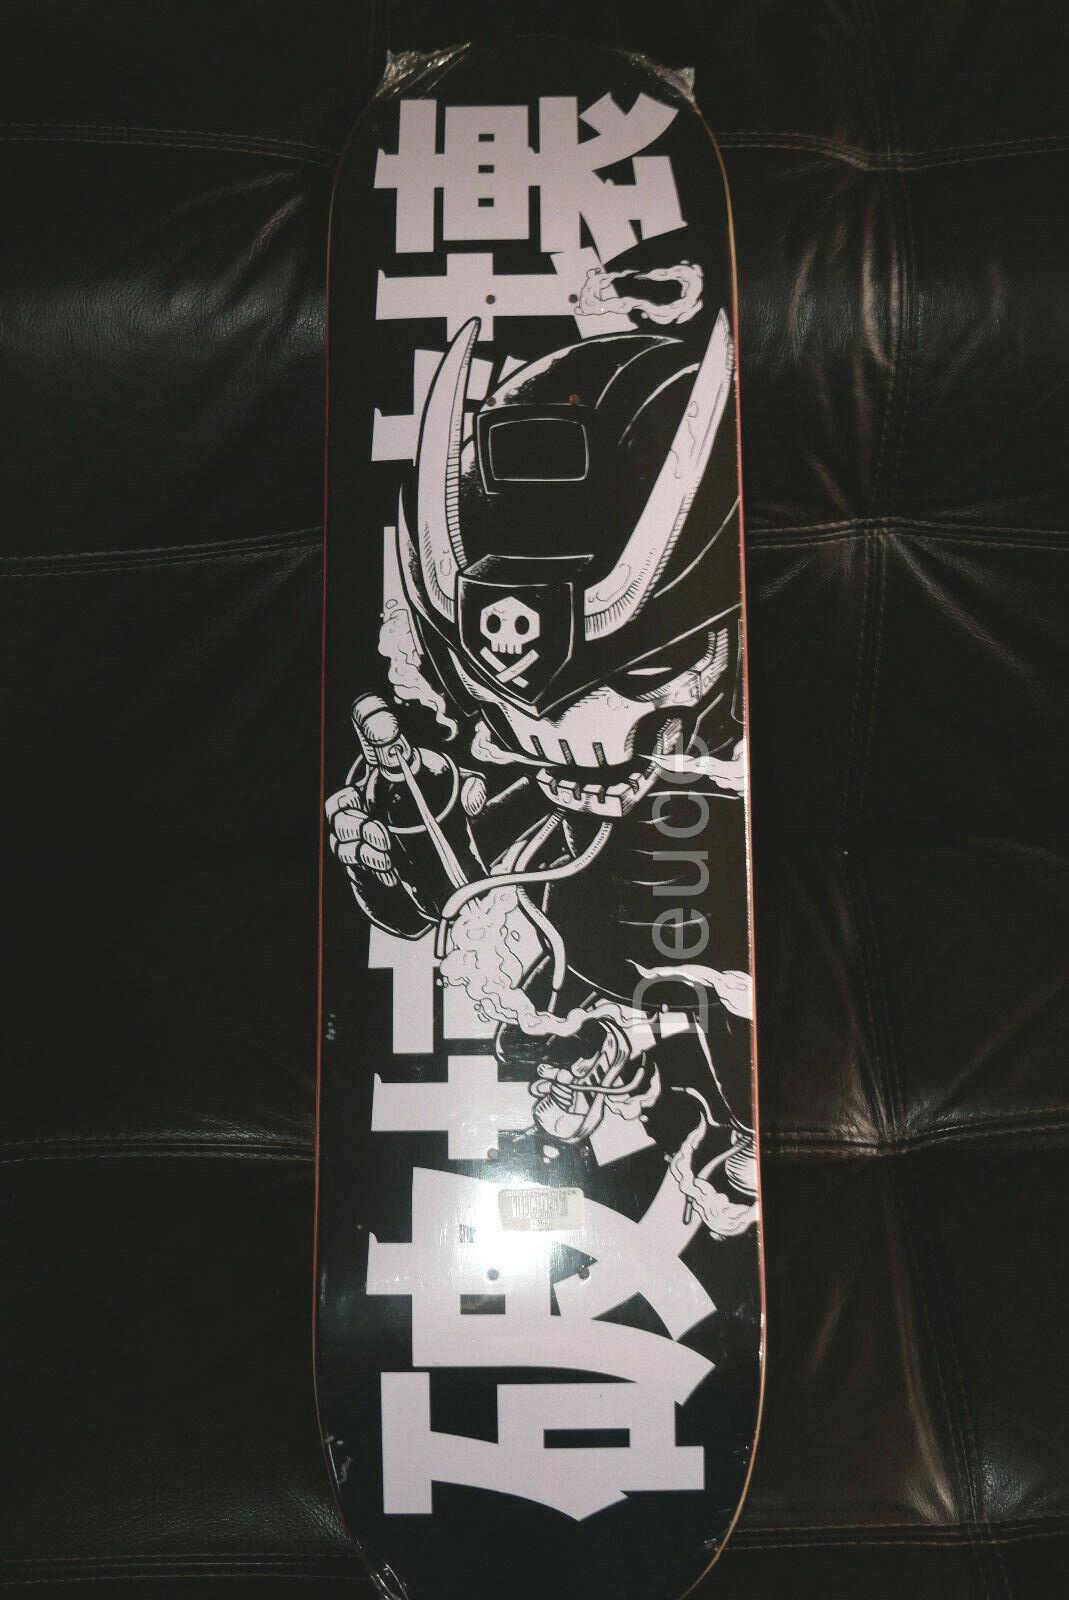 Quiccs ravager, patineta negra cubierta, accesorios exclusivos de sdcc.